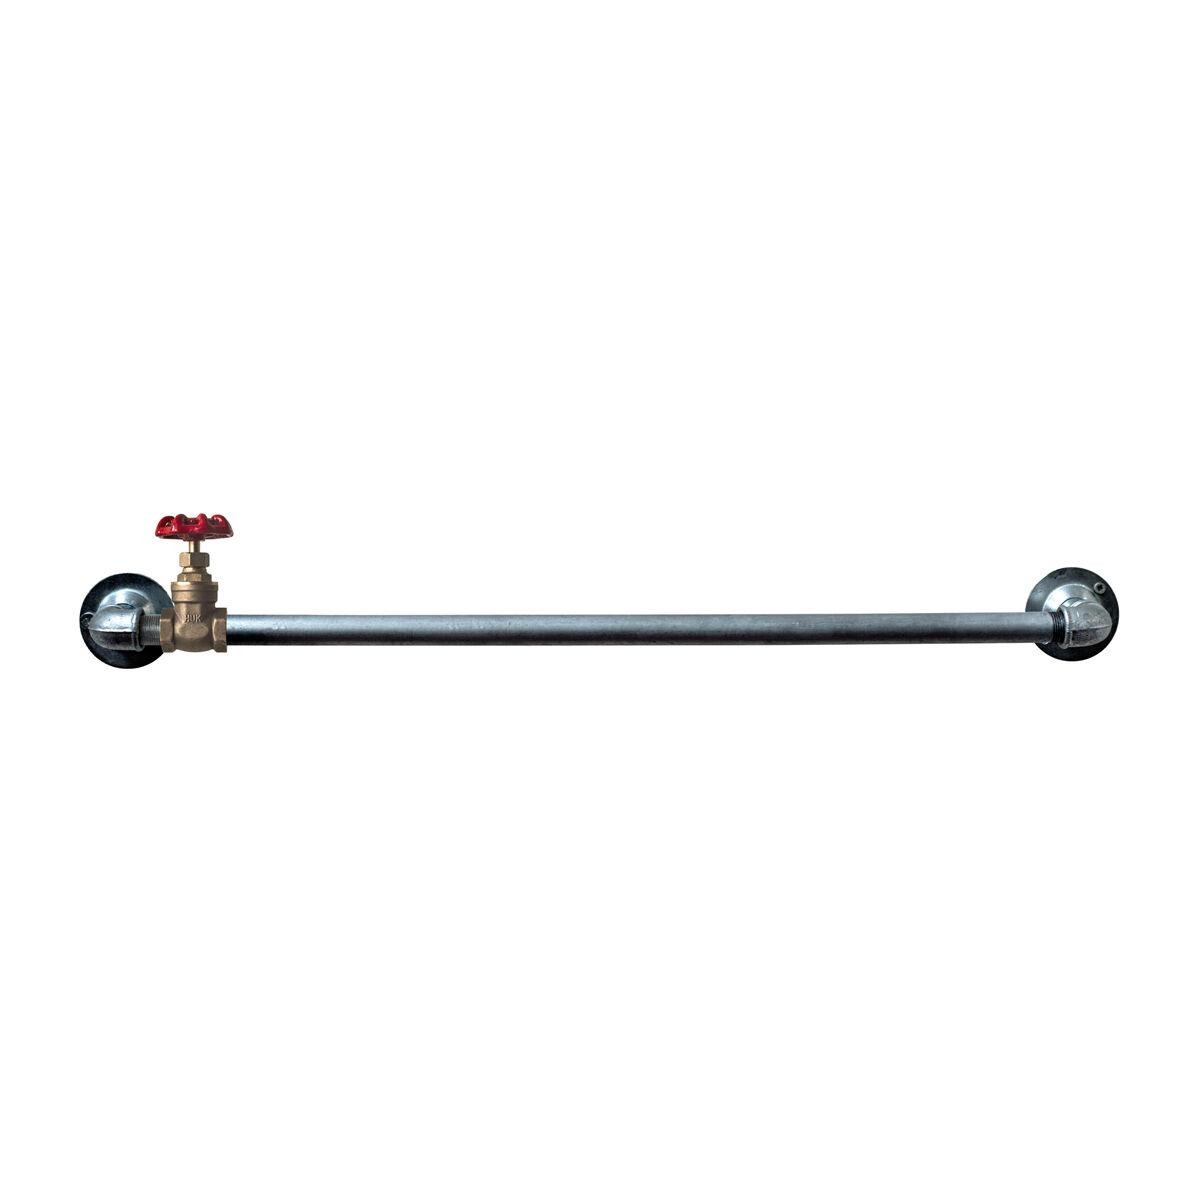 Industrial Steel Conduit Pipe Towel Rail Bathroom Kitchen Rail Rustic